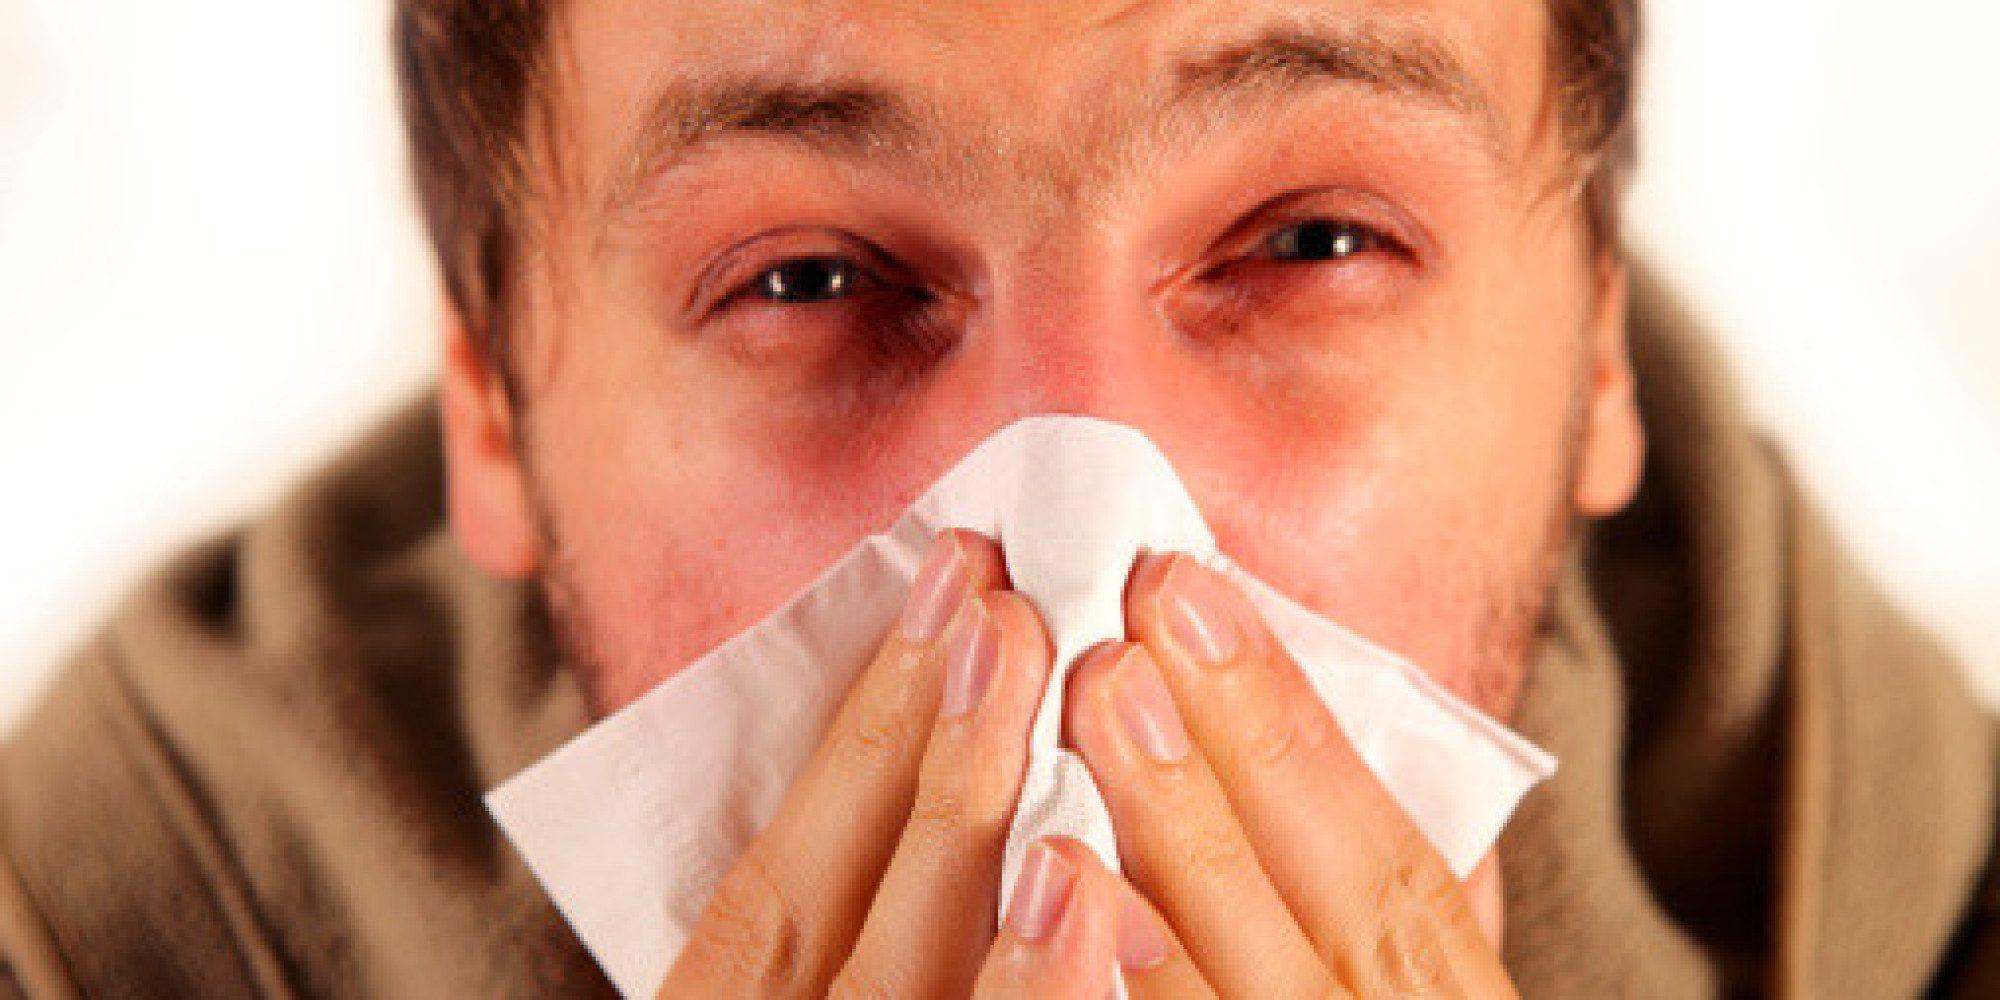 ¿Como se dice, constipado o costipado?